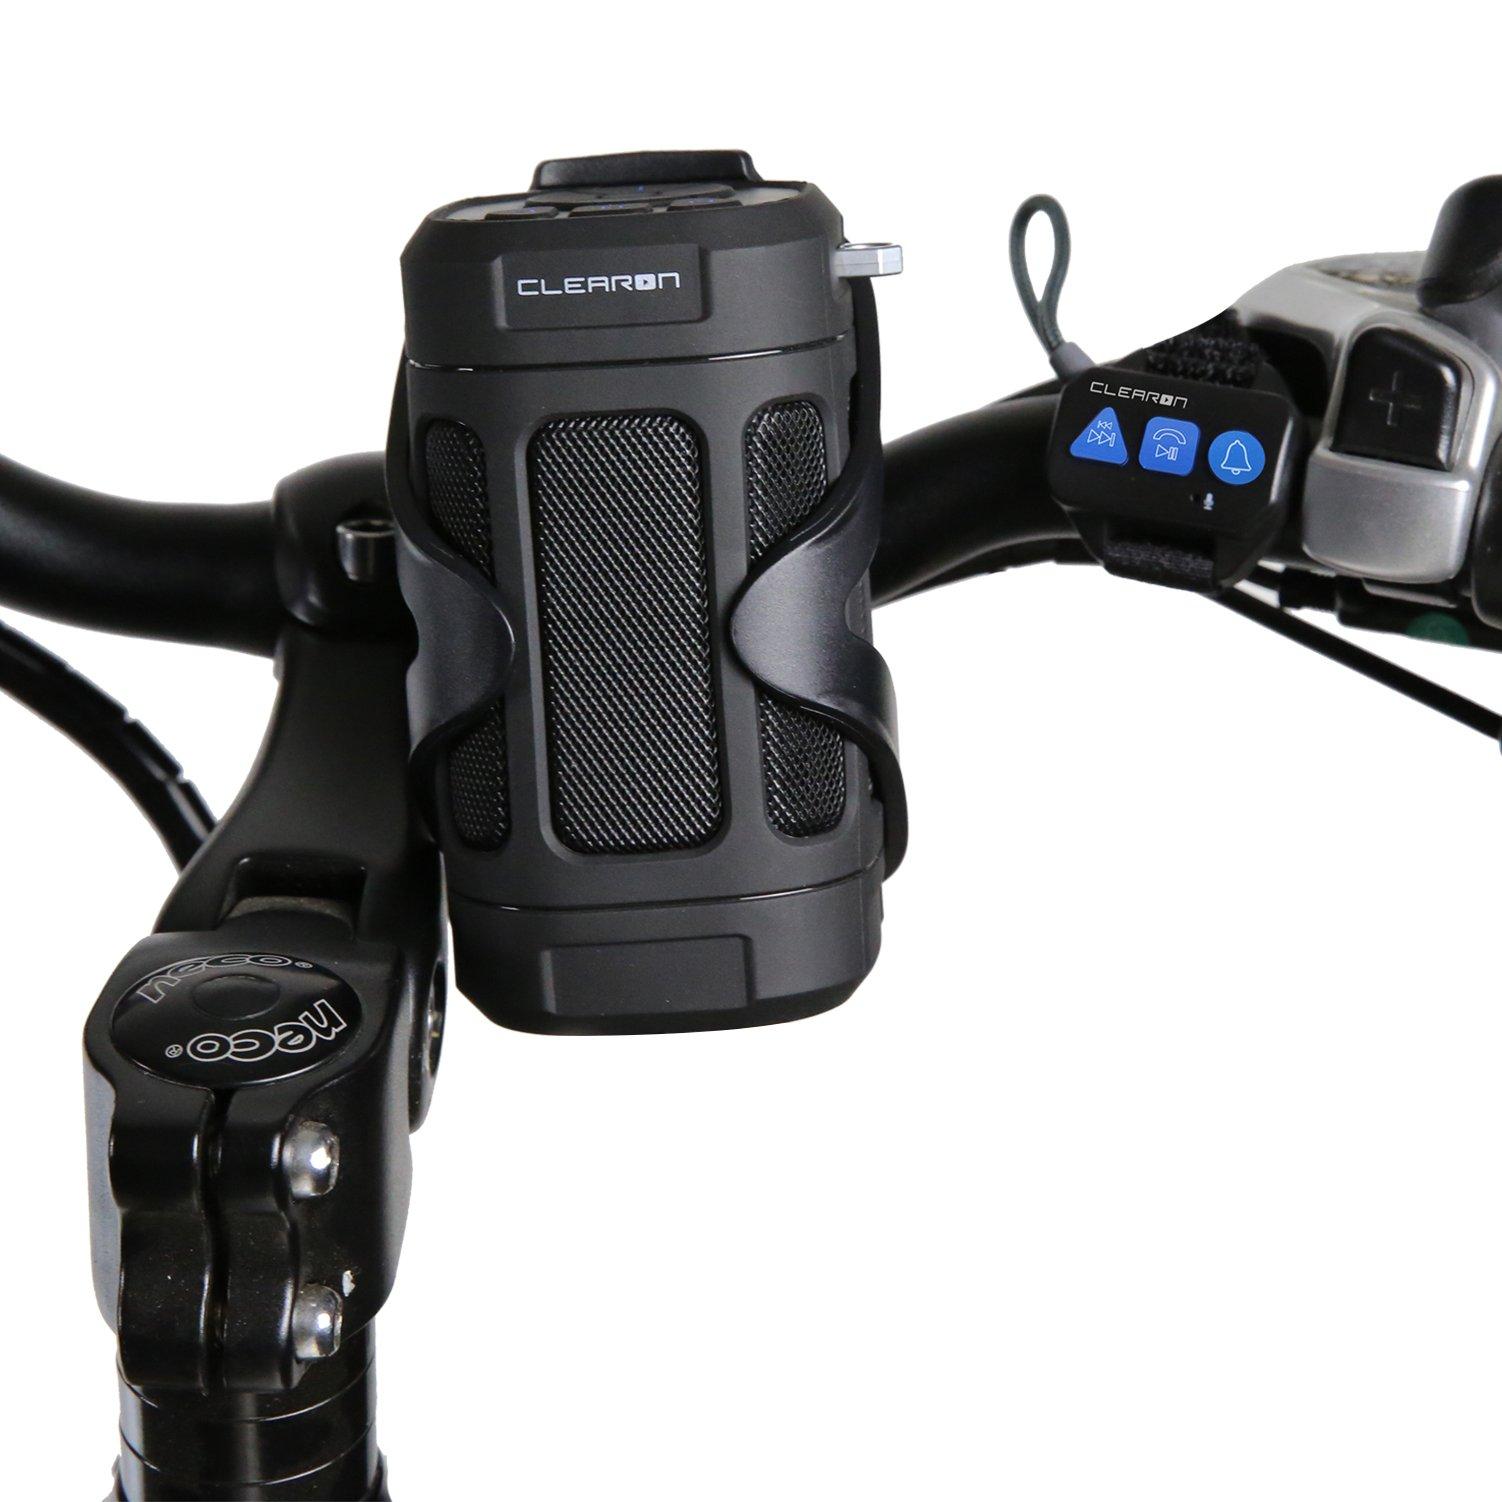 Portable Bluetooth Speaker by CLEARON, Wireless Waterproof Speaker with Bike Mount & Remote, Premium Sound Quality & Loud 8W Mini Speaker, 15 Hours of Playtime & 100 ft. Range (Black)